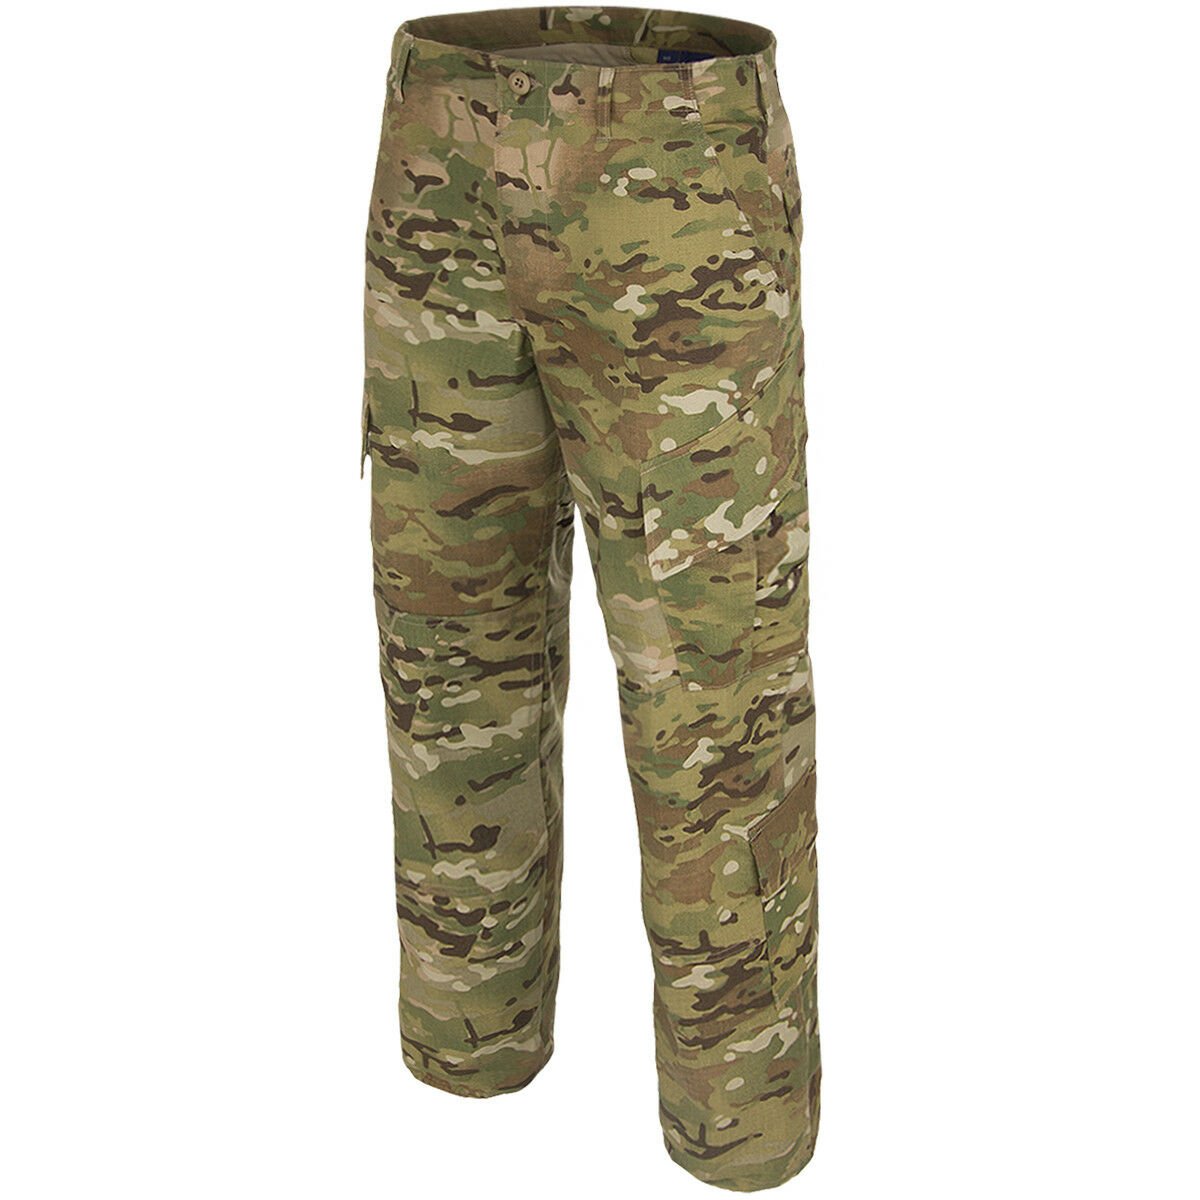 Propper ACU Hose Herren Cargo Combat Uniform Hose Army Ripstop MultiCam Camo